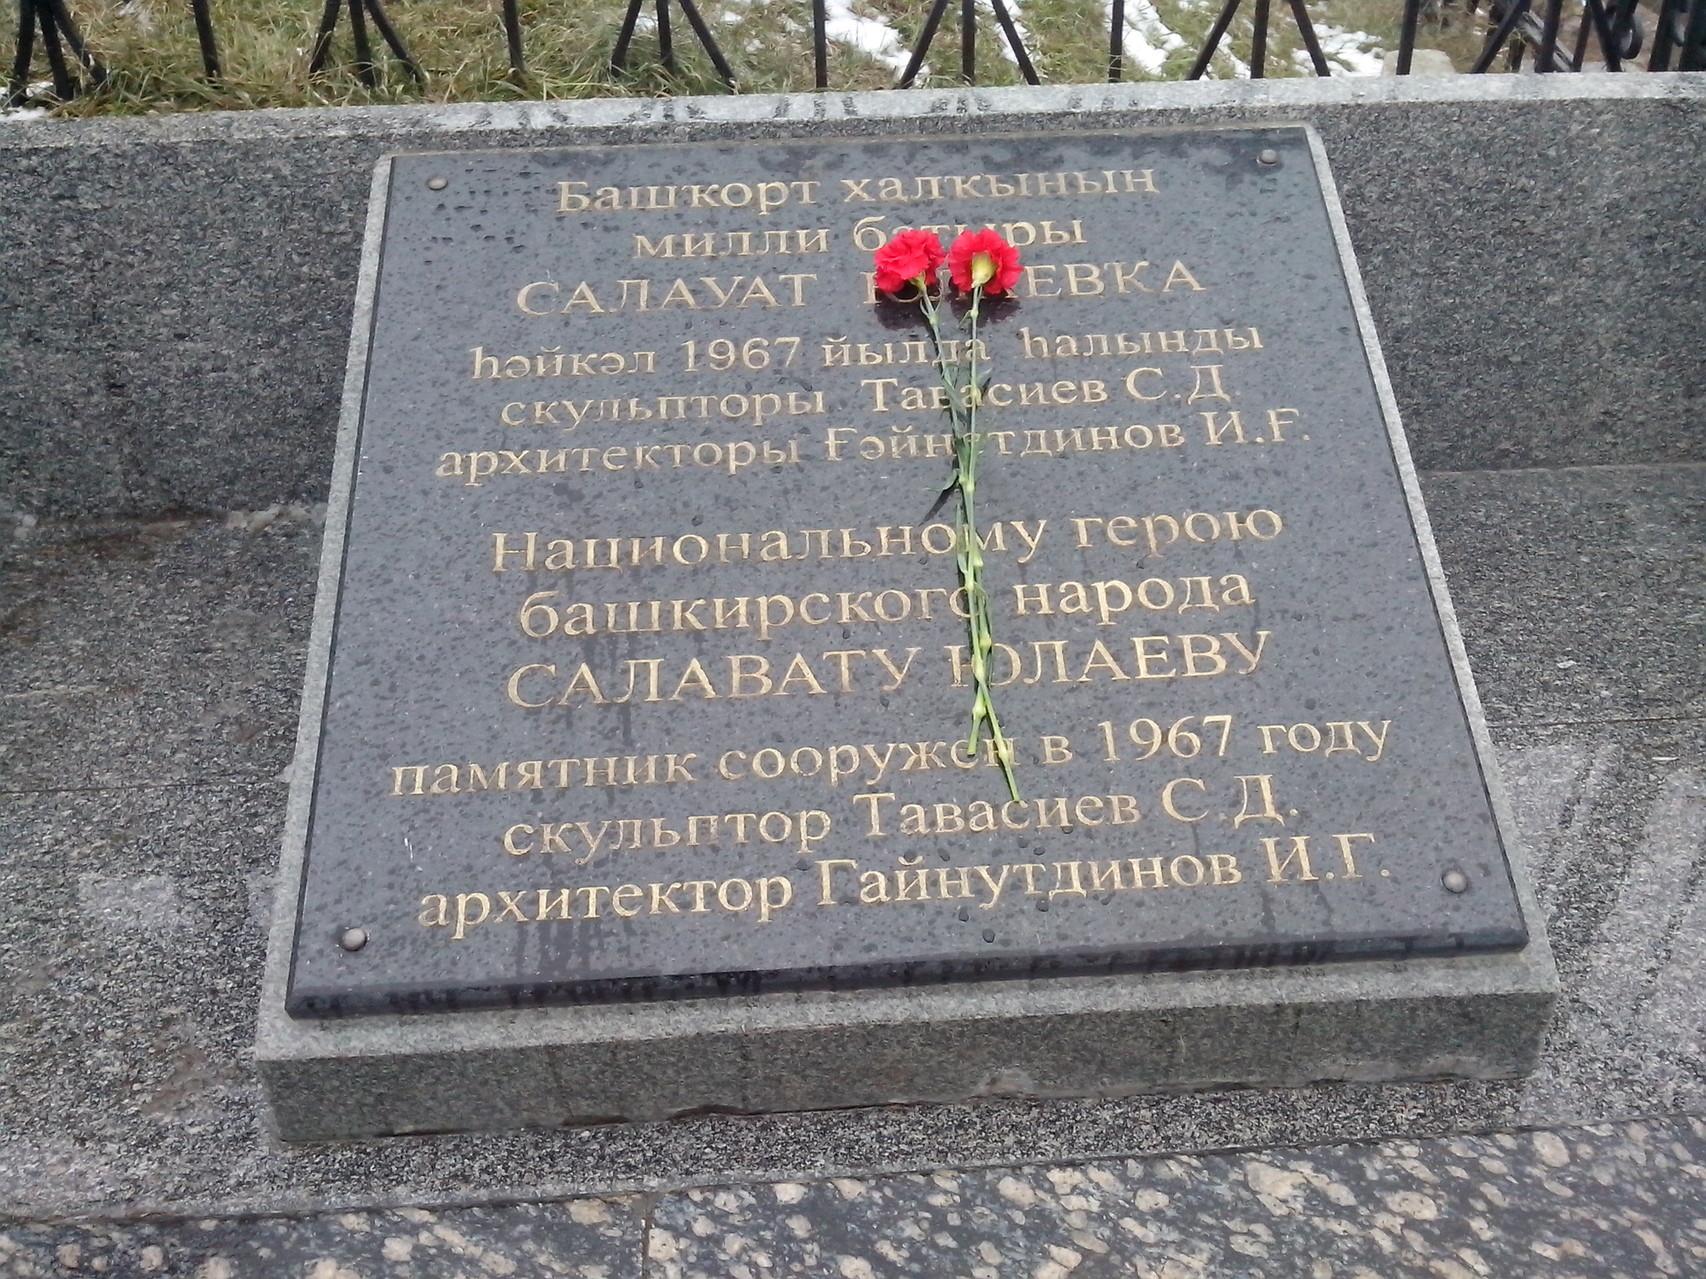 Мемориальная доска у памятника Салавата Юлаева